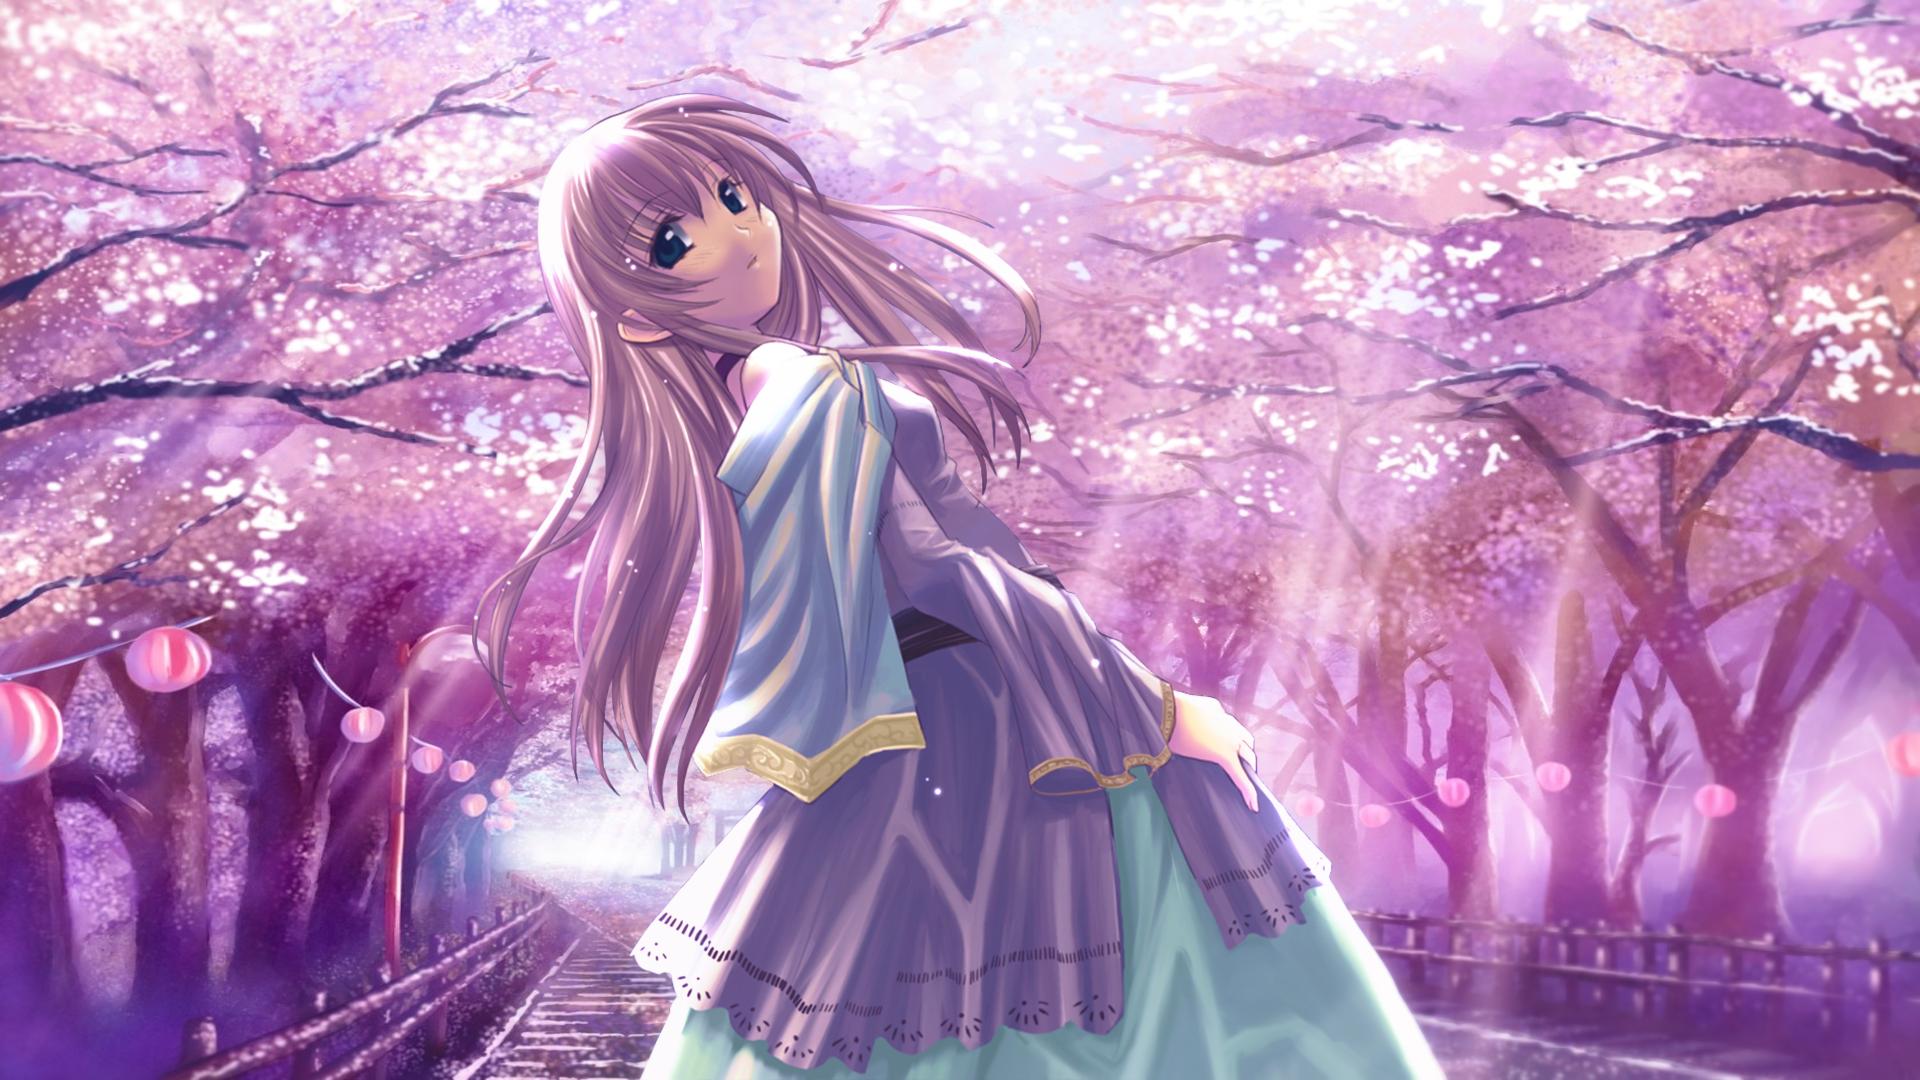 hinh nen anime girl dang yeu 25